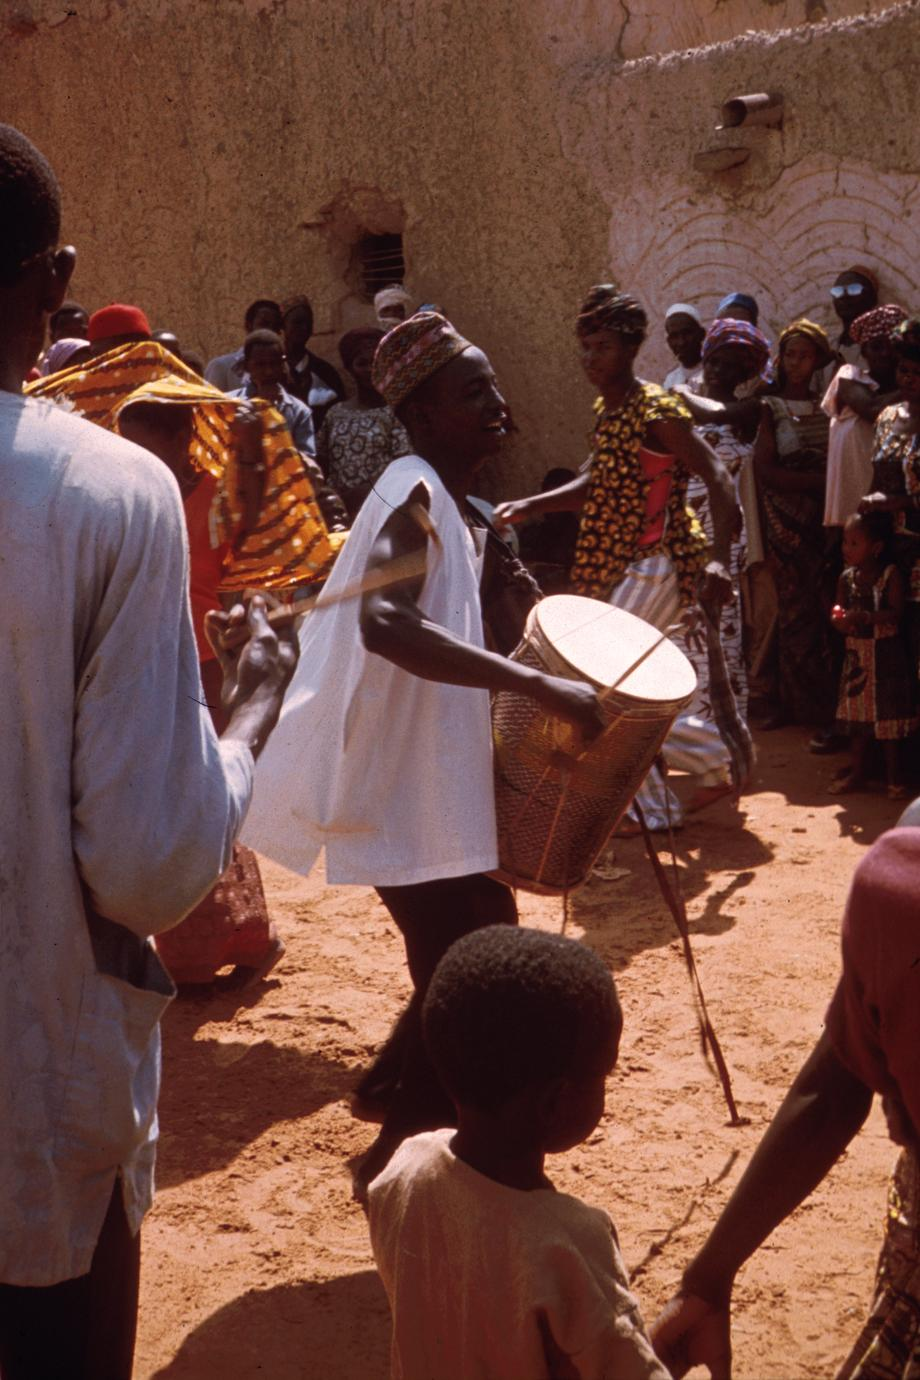 A Zarma Drummer in Mirria, Niger